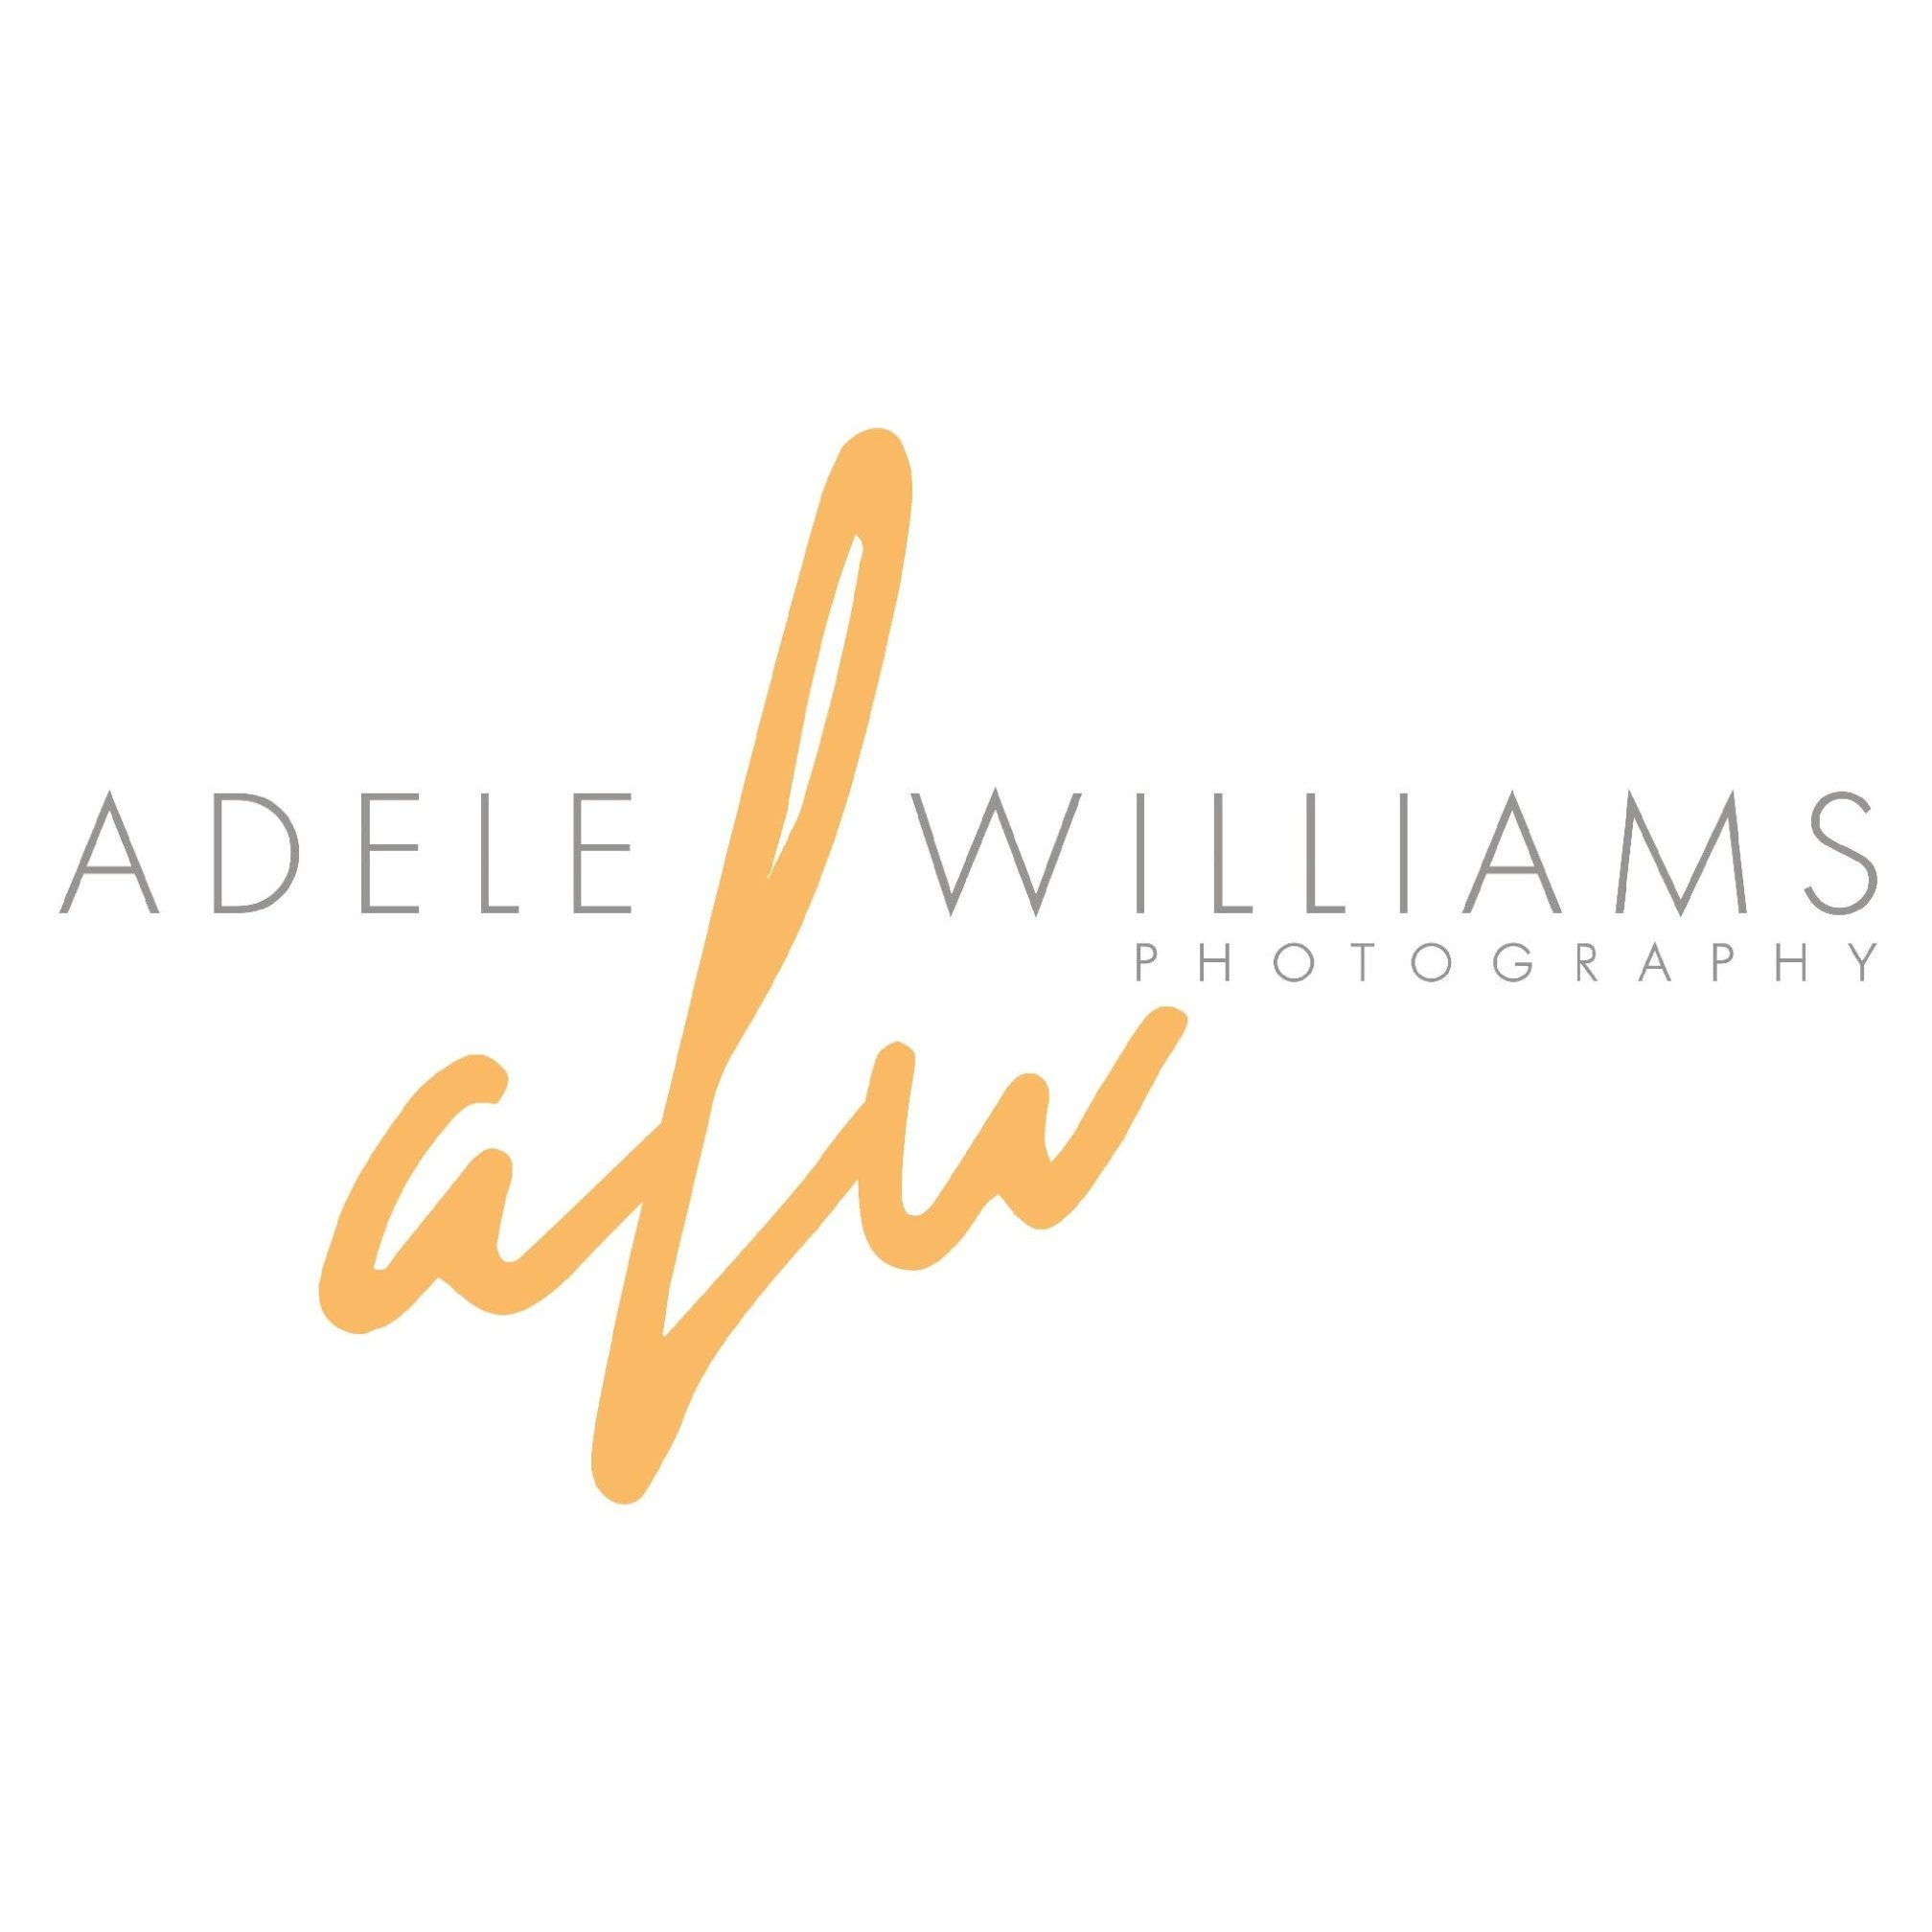 Adele Williams Photography - Wokingham, Berkshire RG40 3RL - 07525 047994 | ShowMeLocal.com